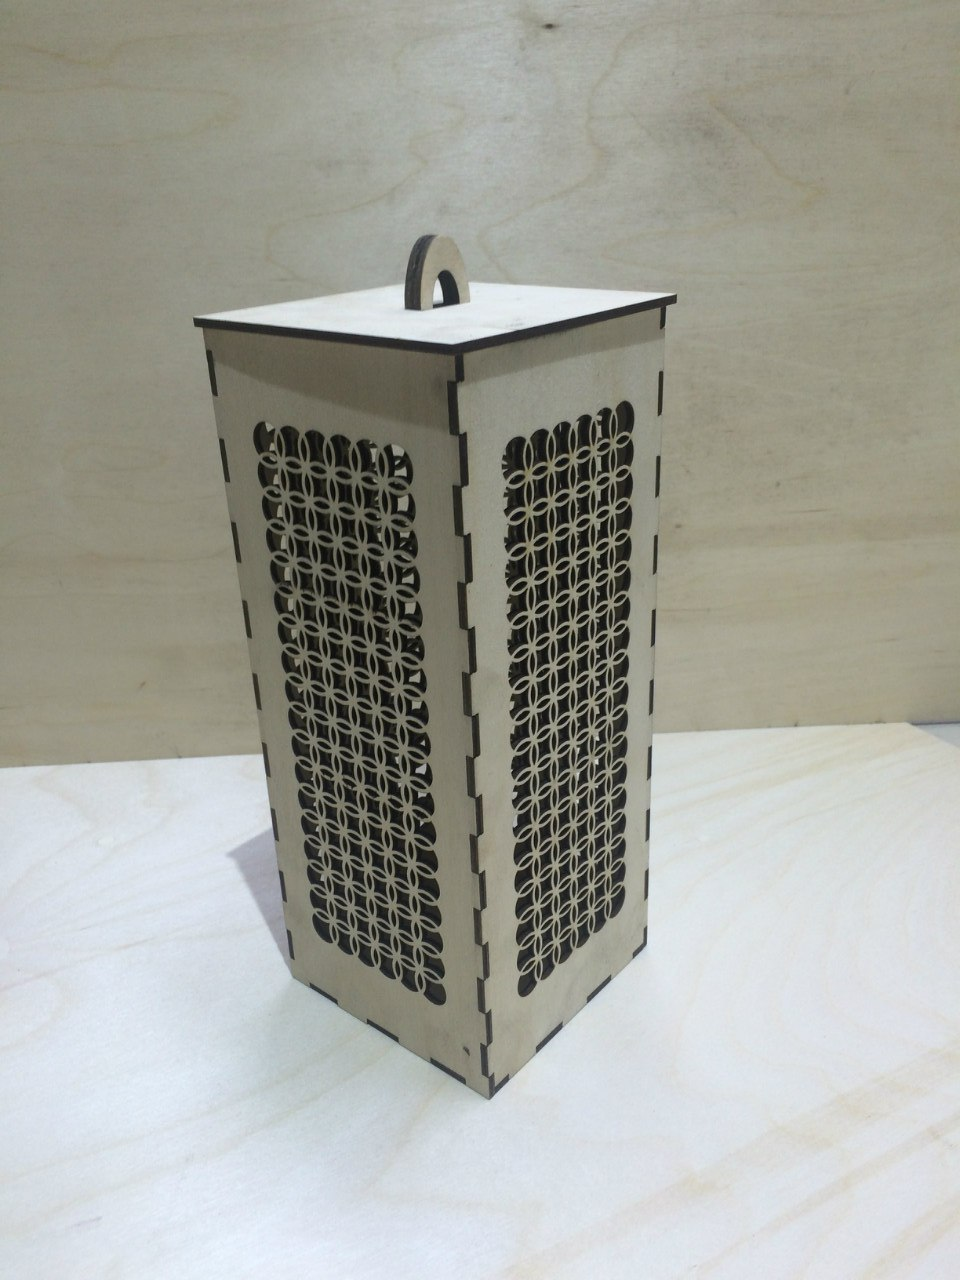 Laser Cut Wooden Storage Box Free CDR Vectors Art